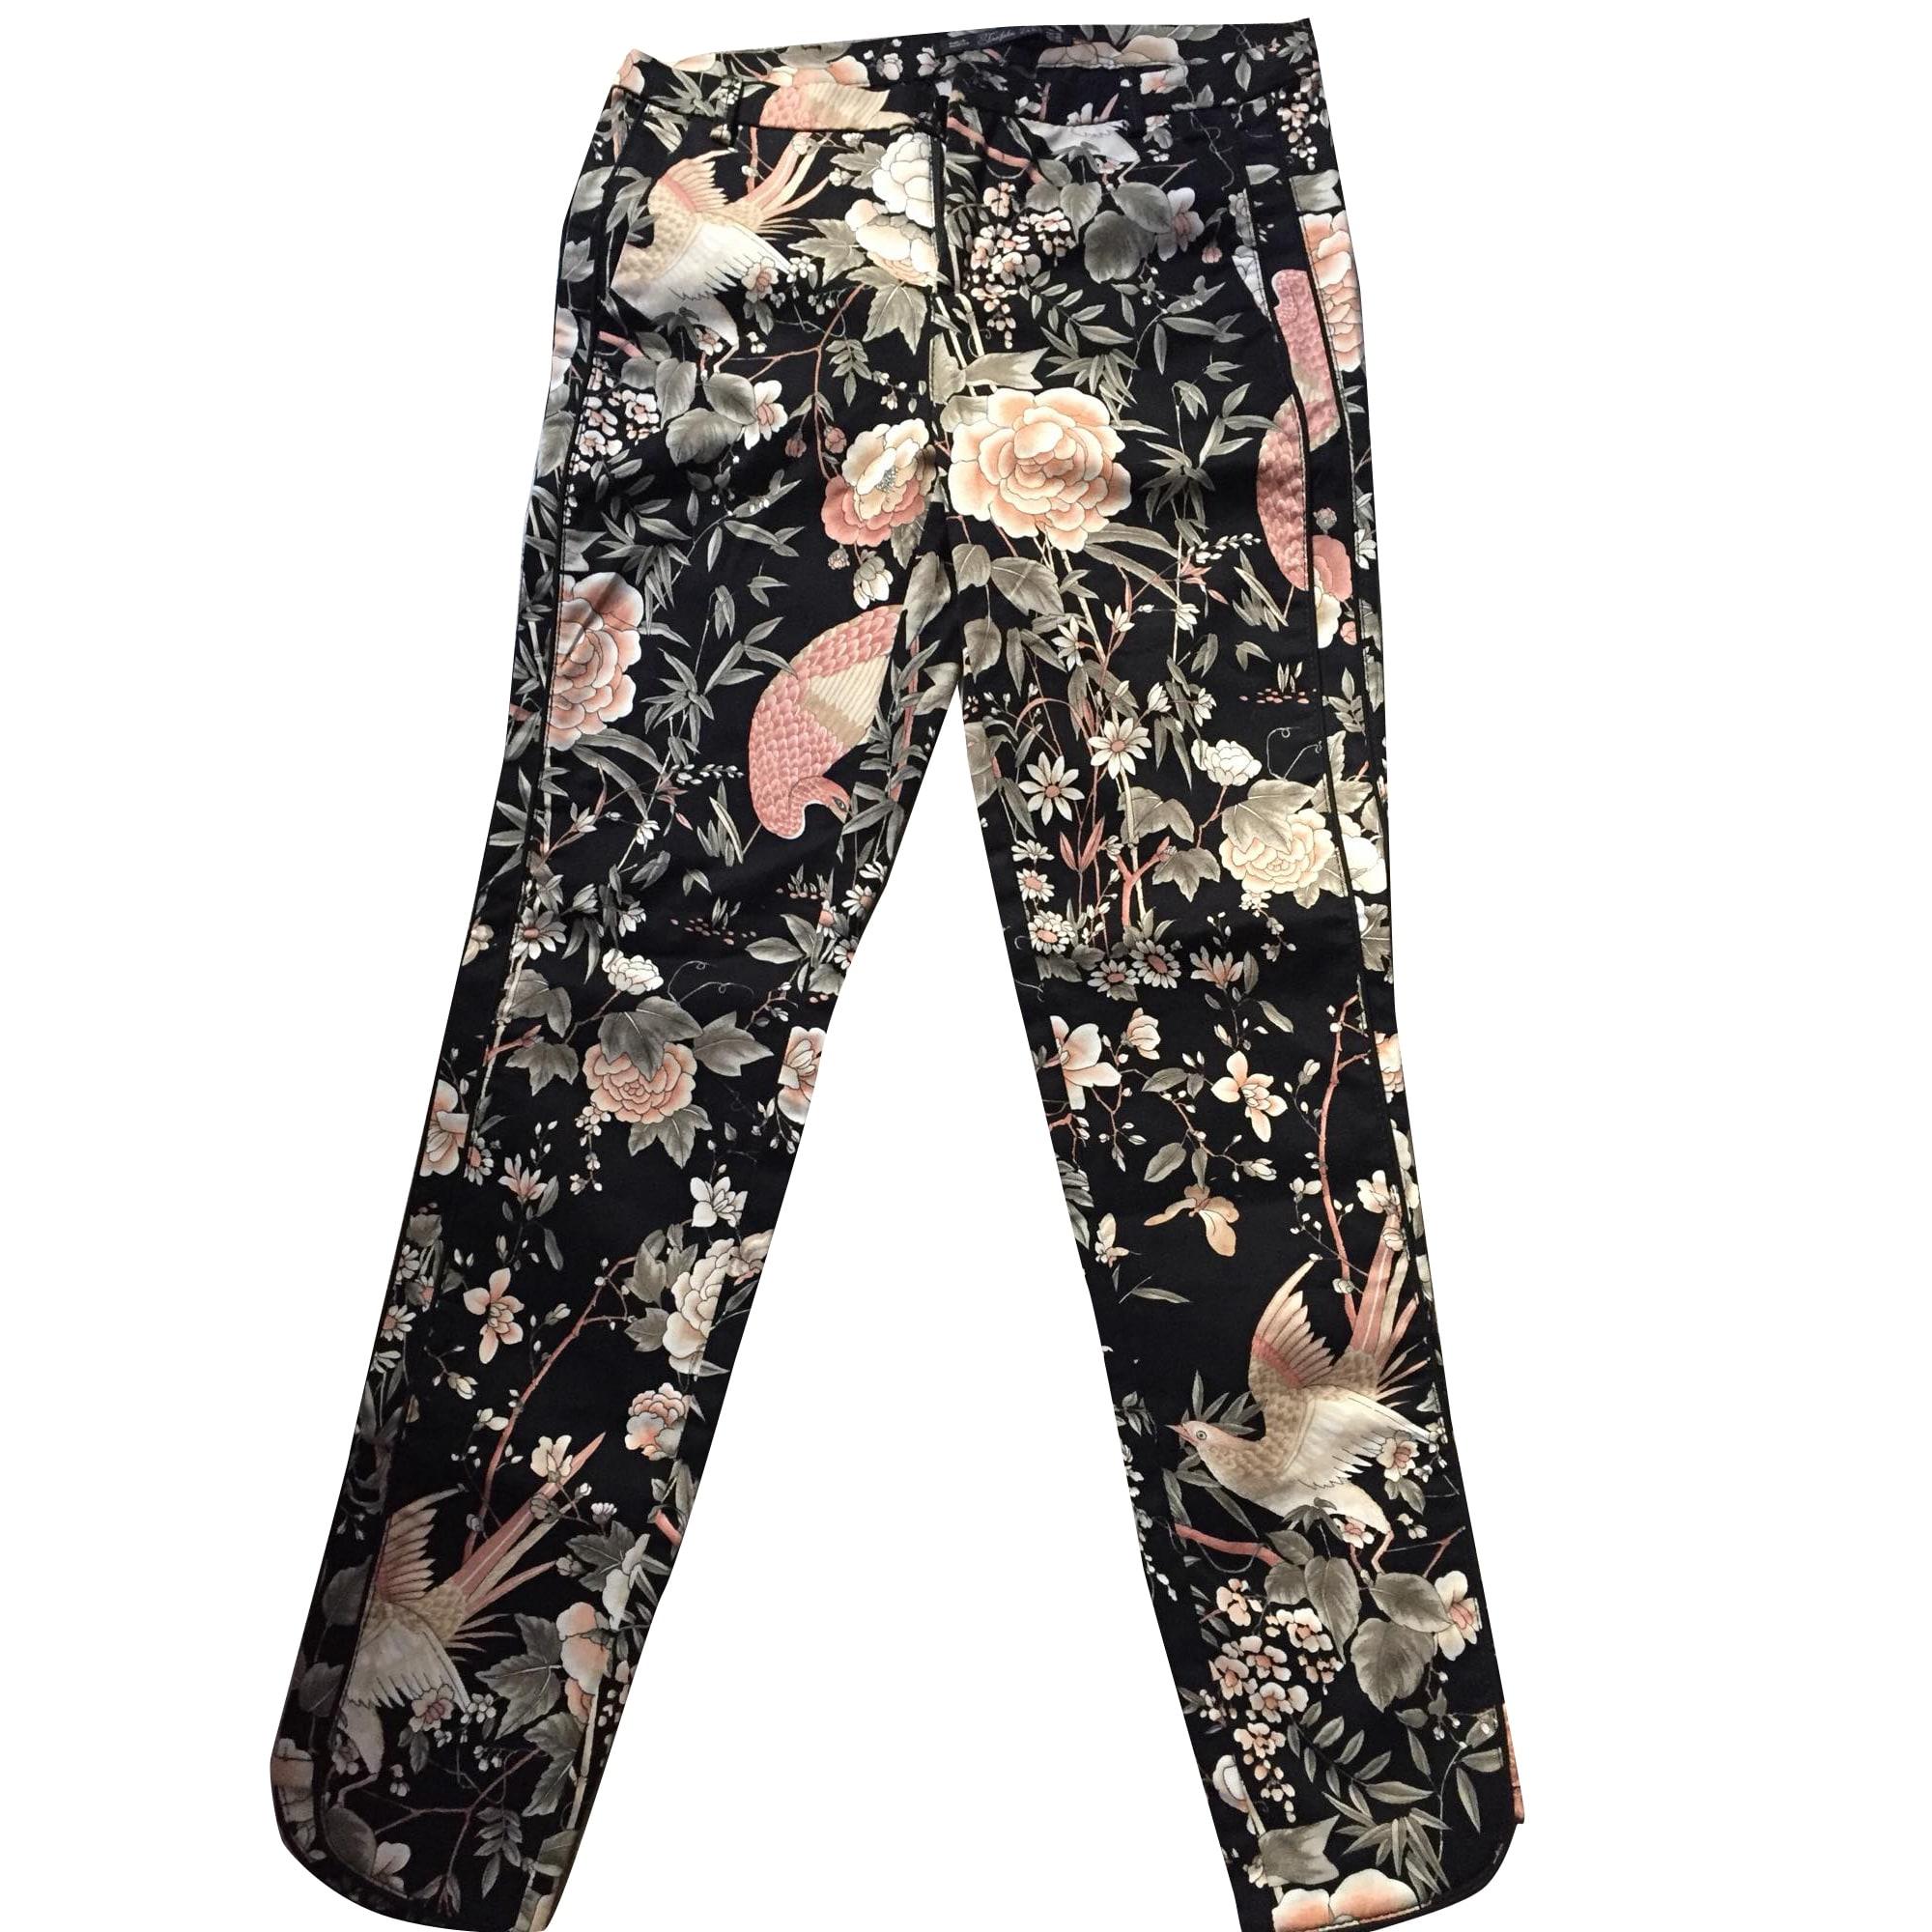 pantalon fleuri homme zara